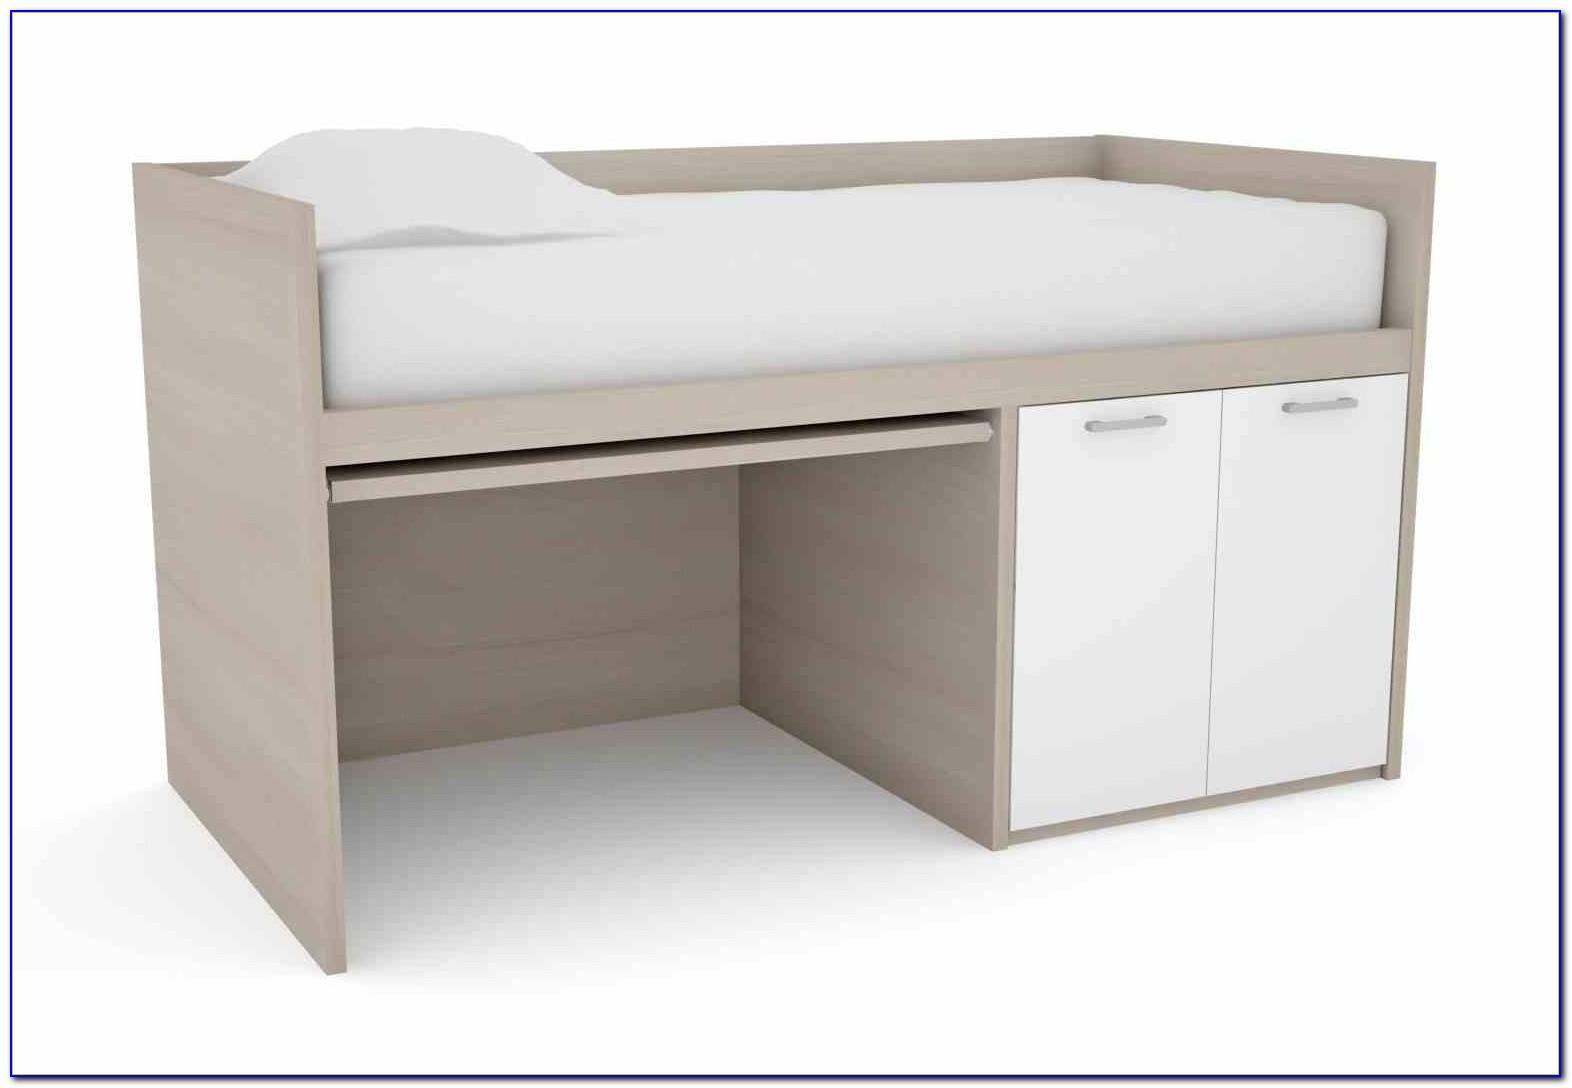 Bunk Beds With Desk Australia